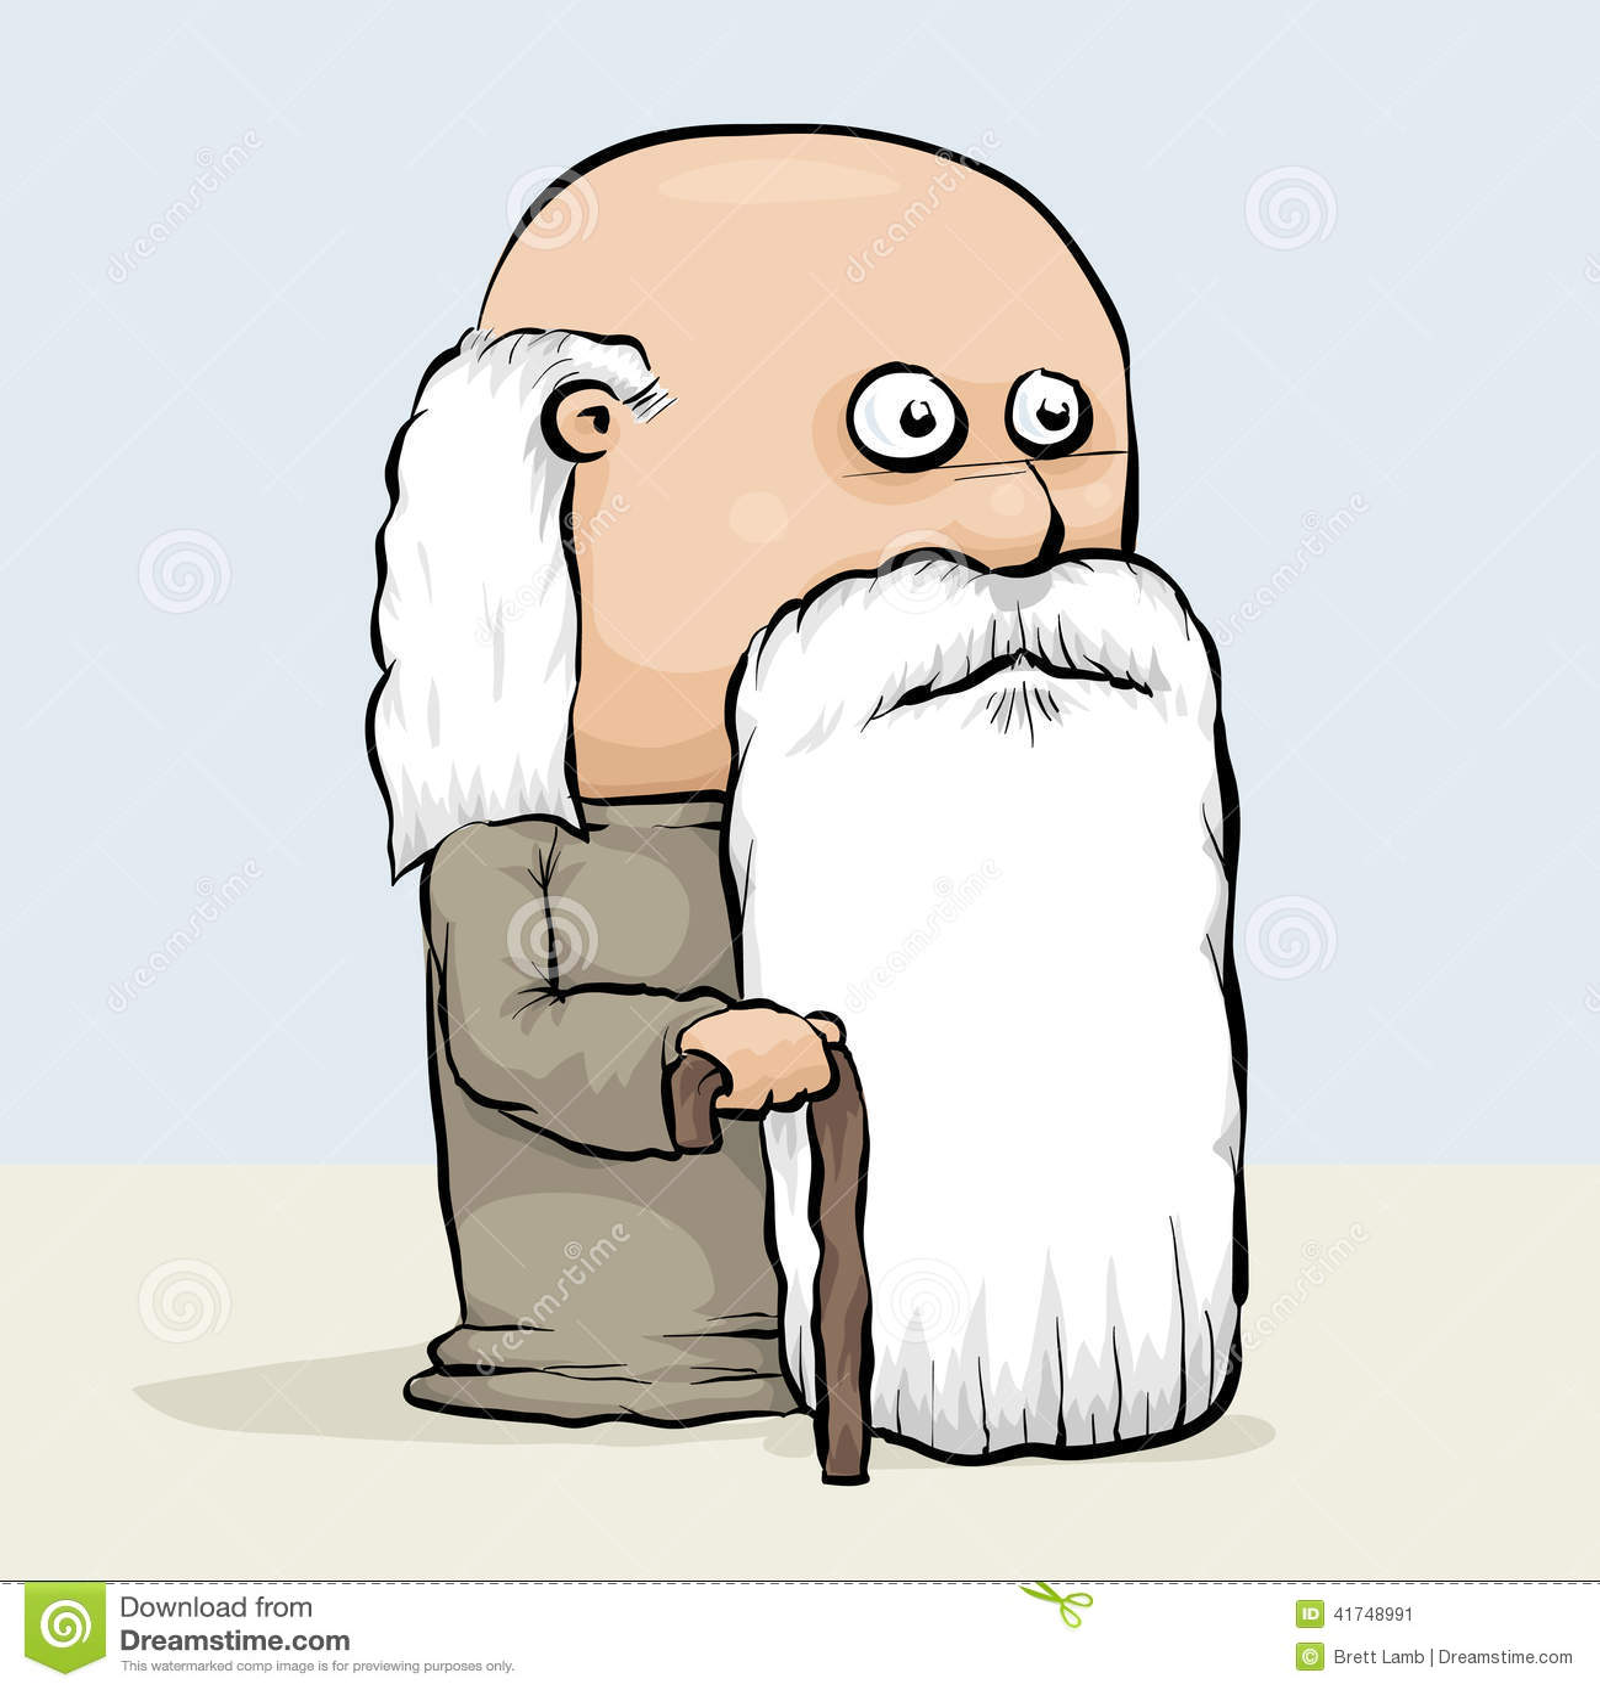 Illustration Old Man Image & Photo (Free Trial) | Bigstock